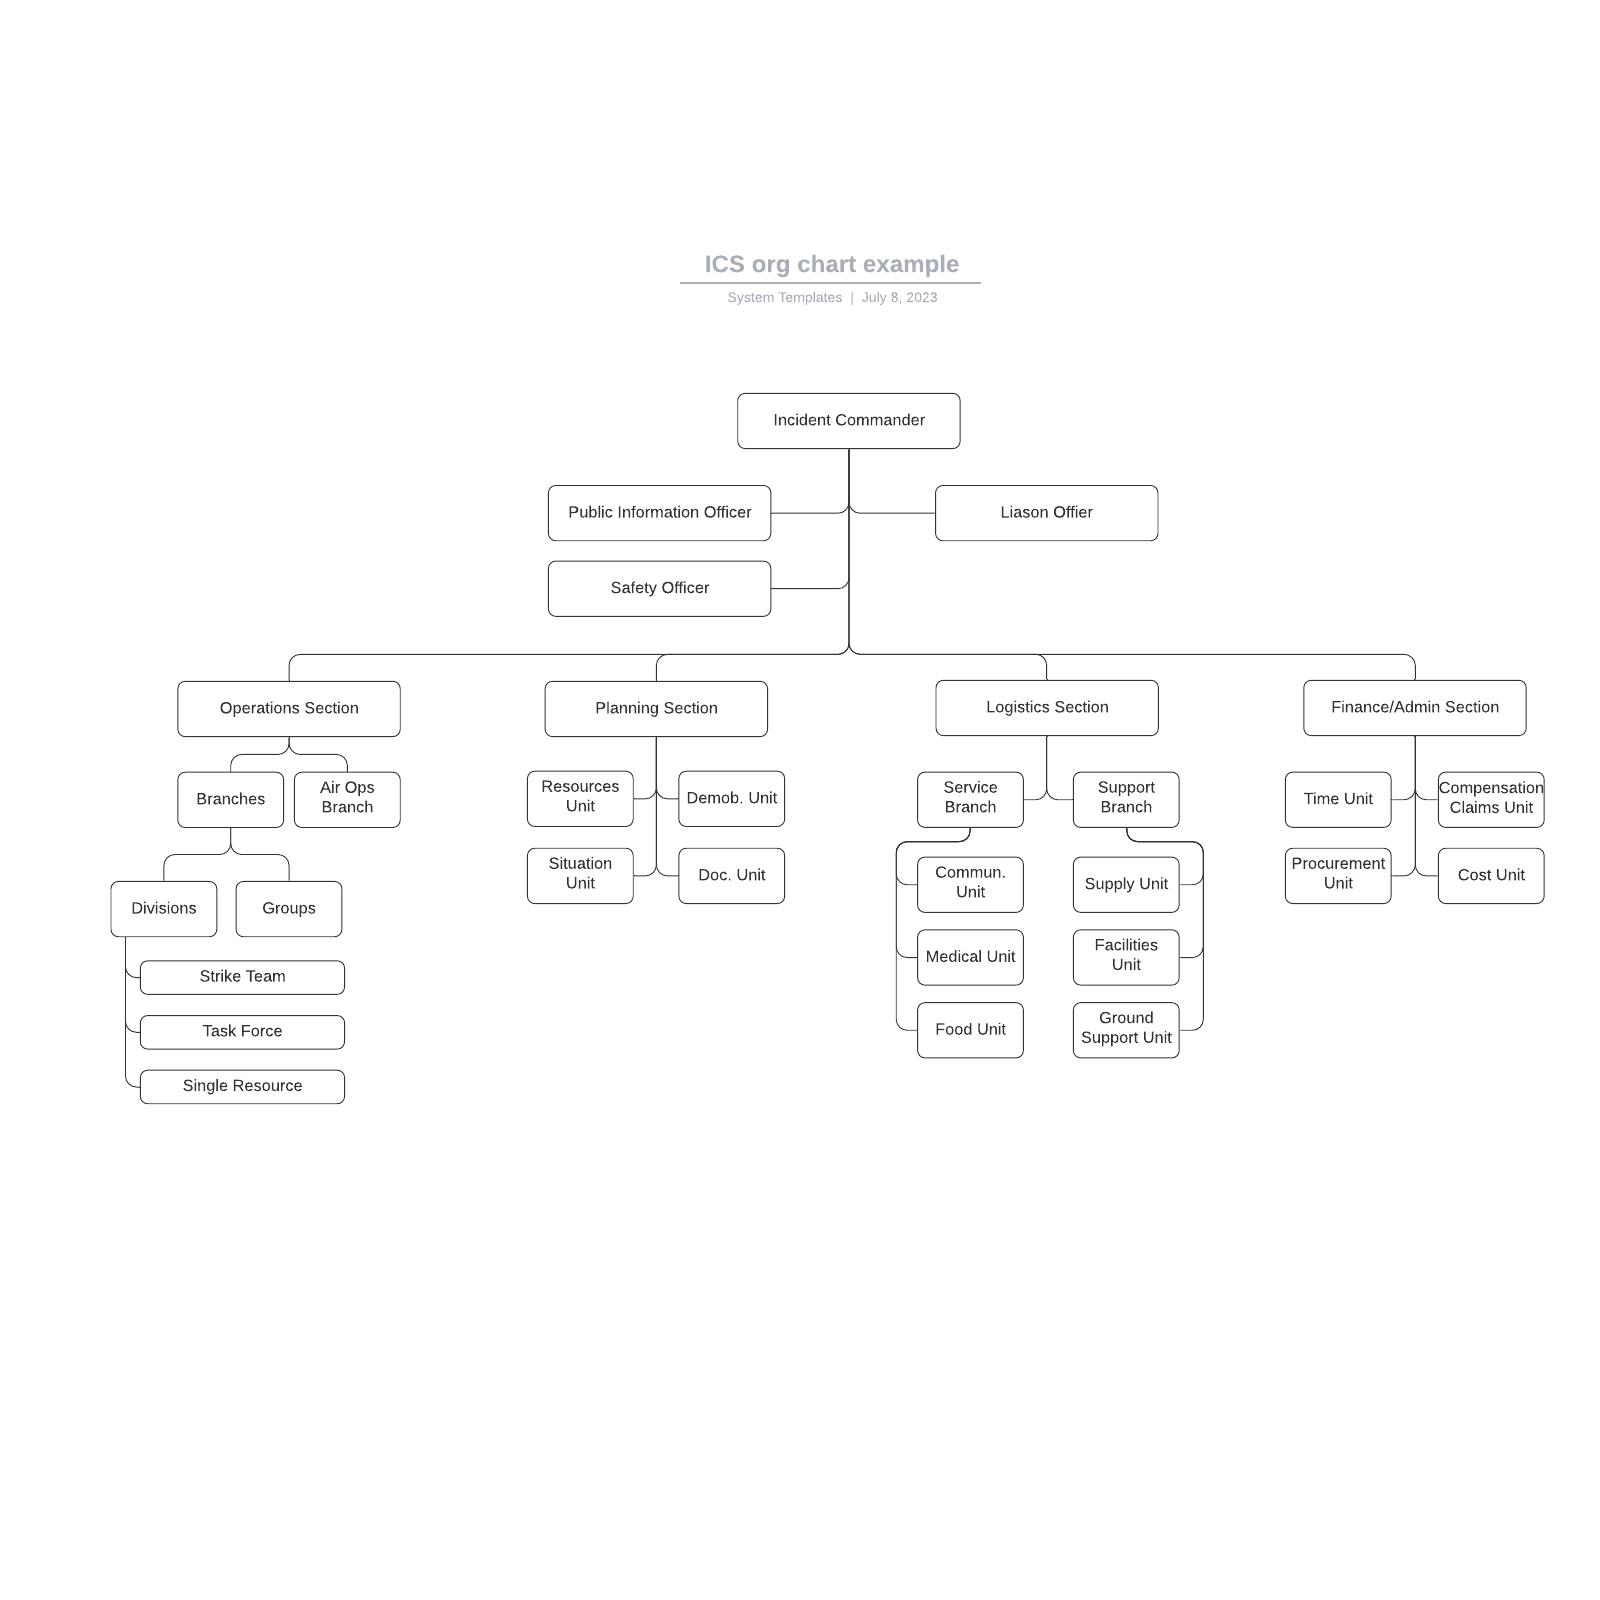 ICS org chart example